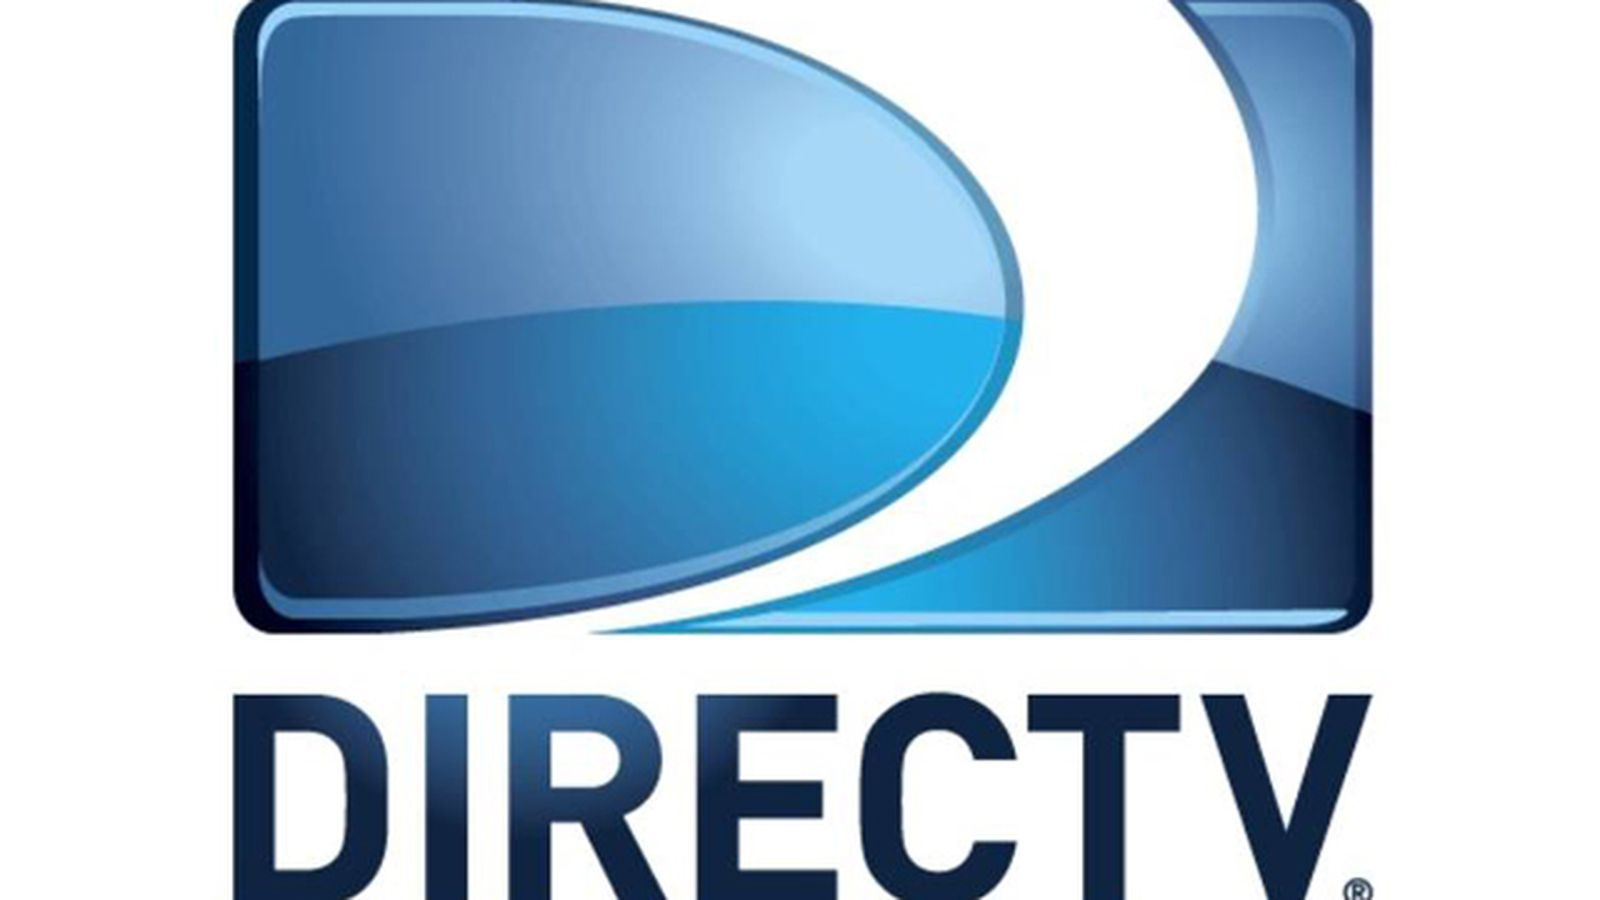 DirecTV to raise prices for satellite TV in 2014 - The Verge